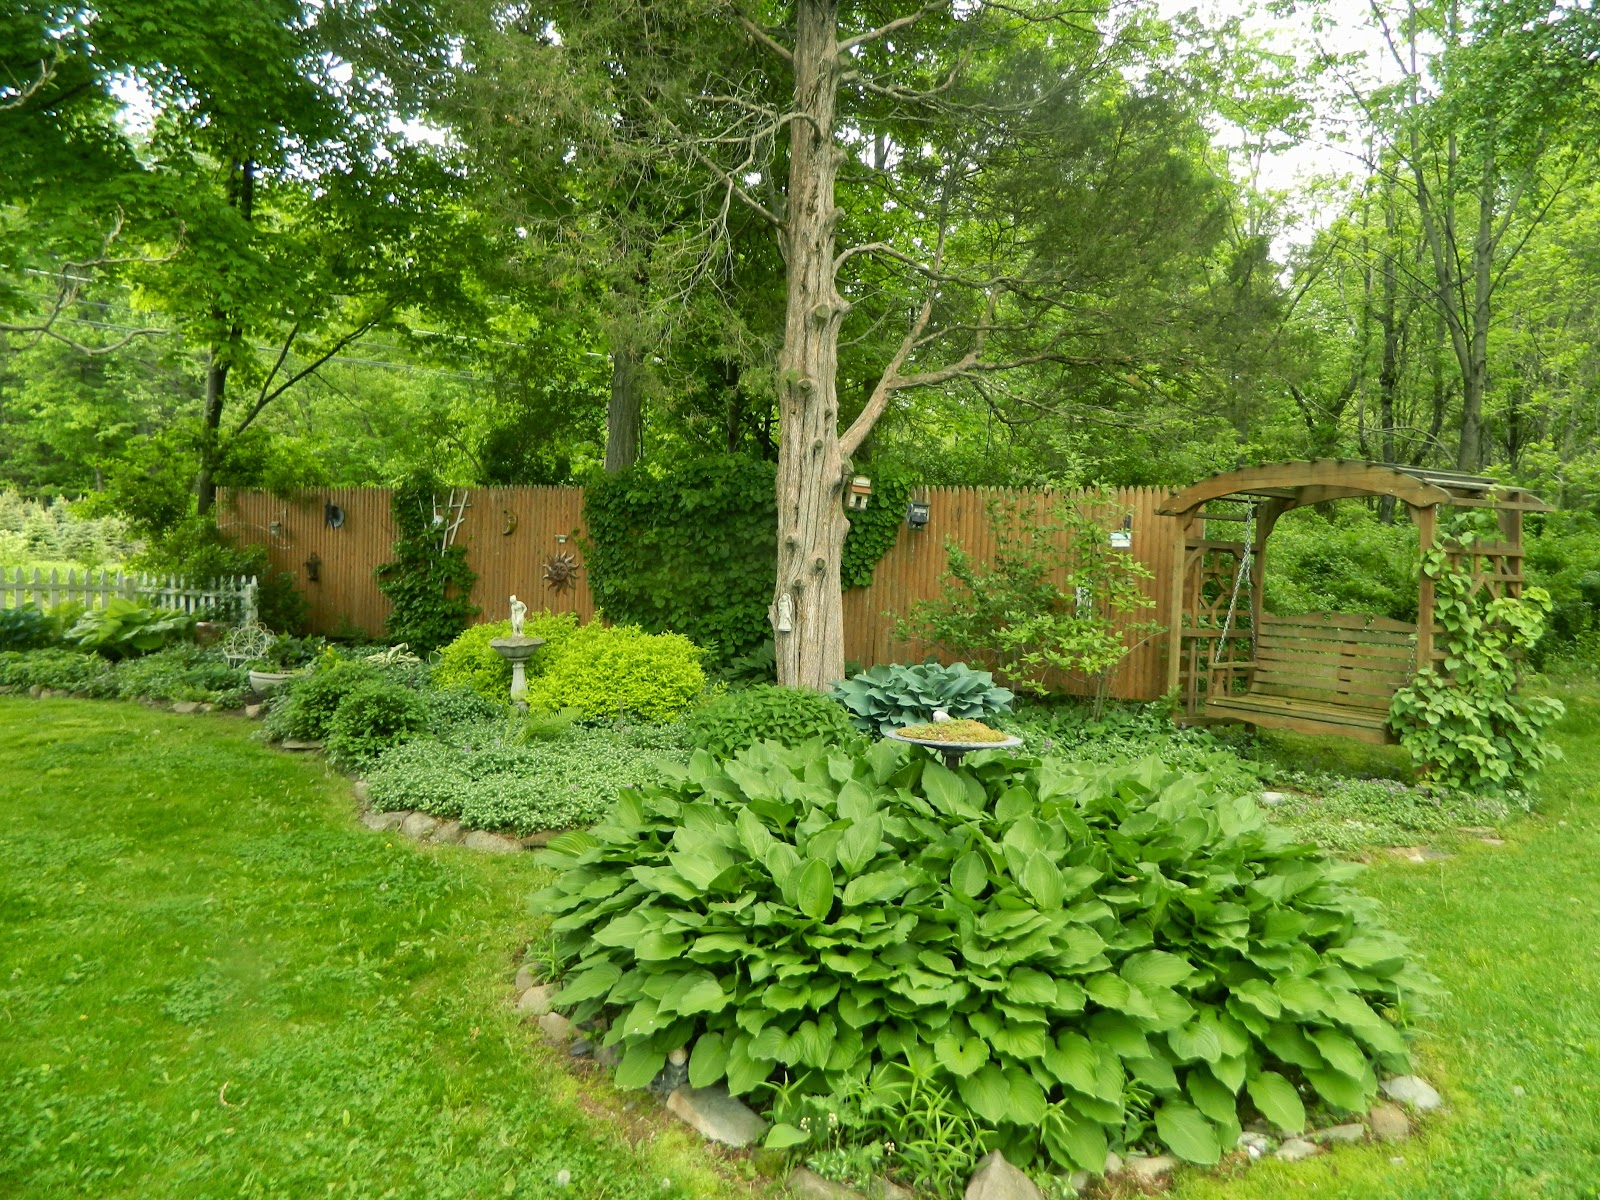 pam u0026 39 s english cottage garden  see how my garden grows